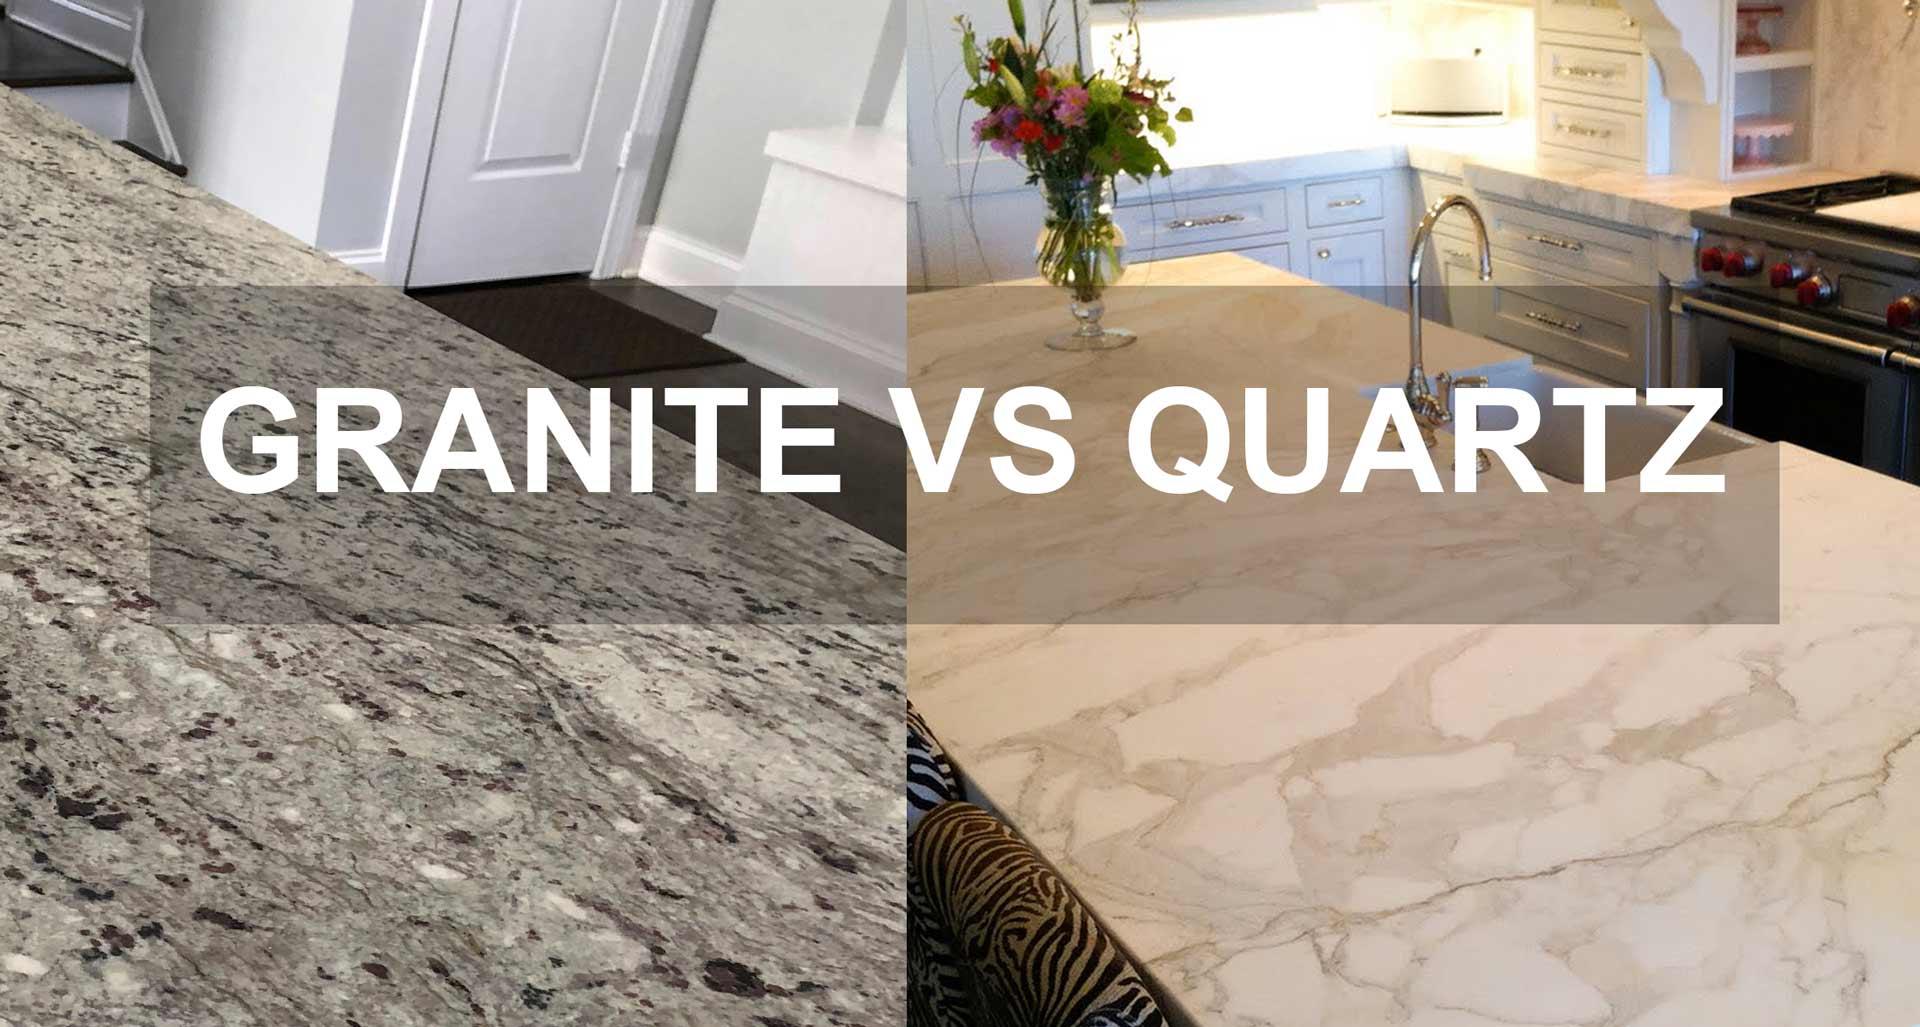 Granite versus quartz countertops for kitchen and bathroom